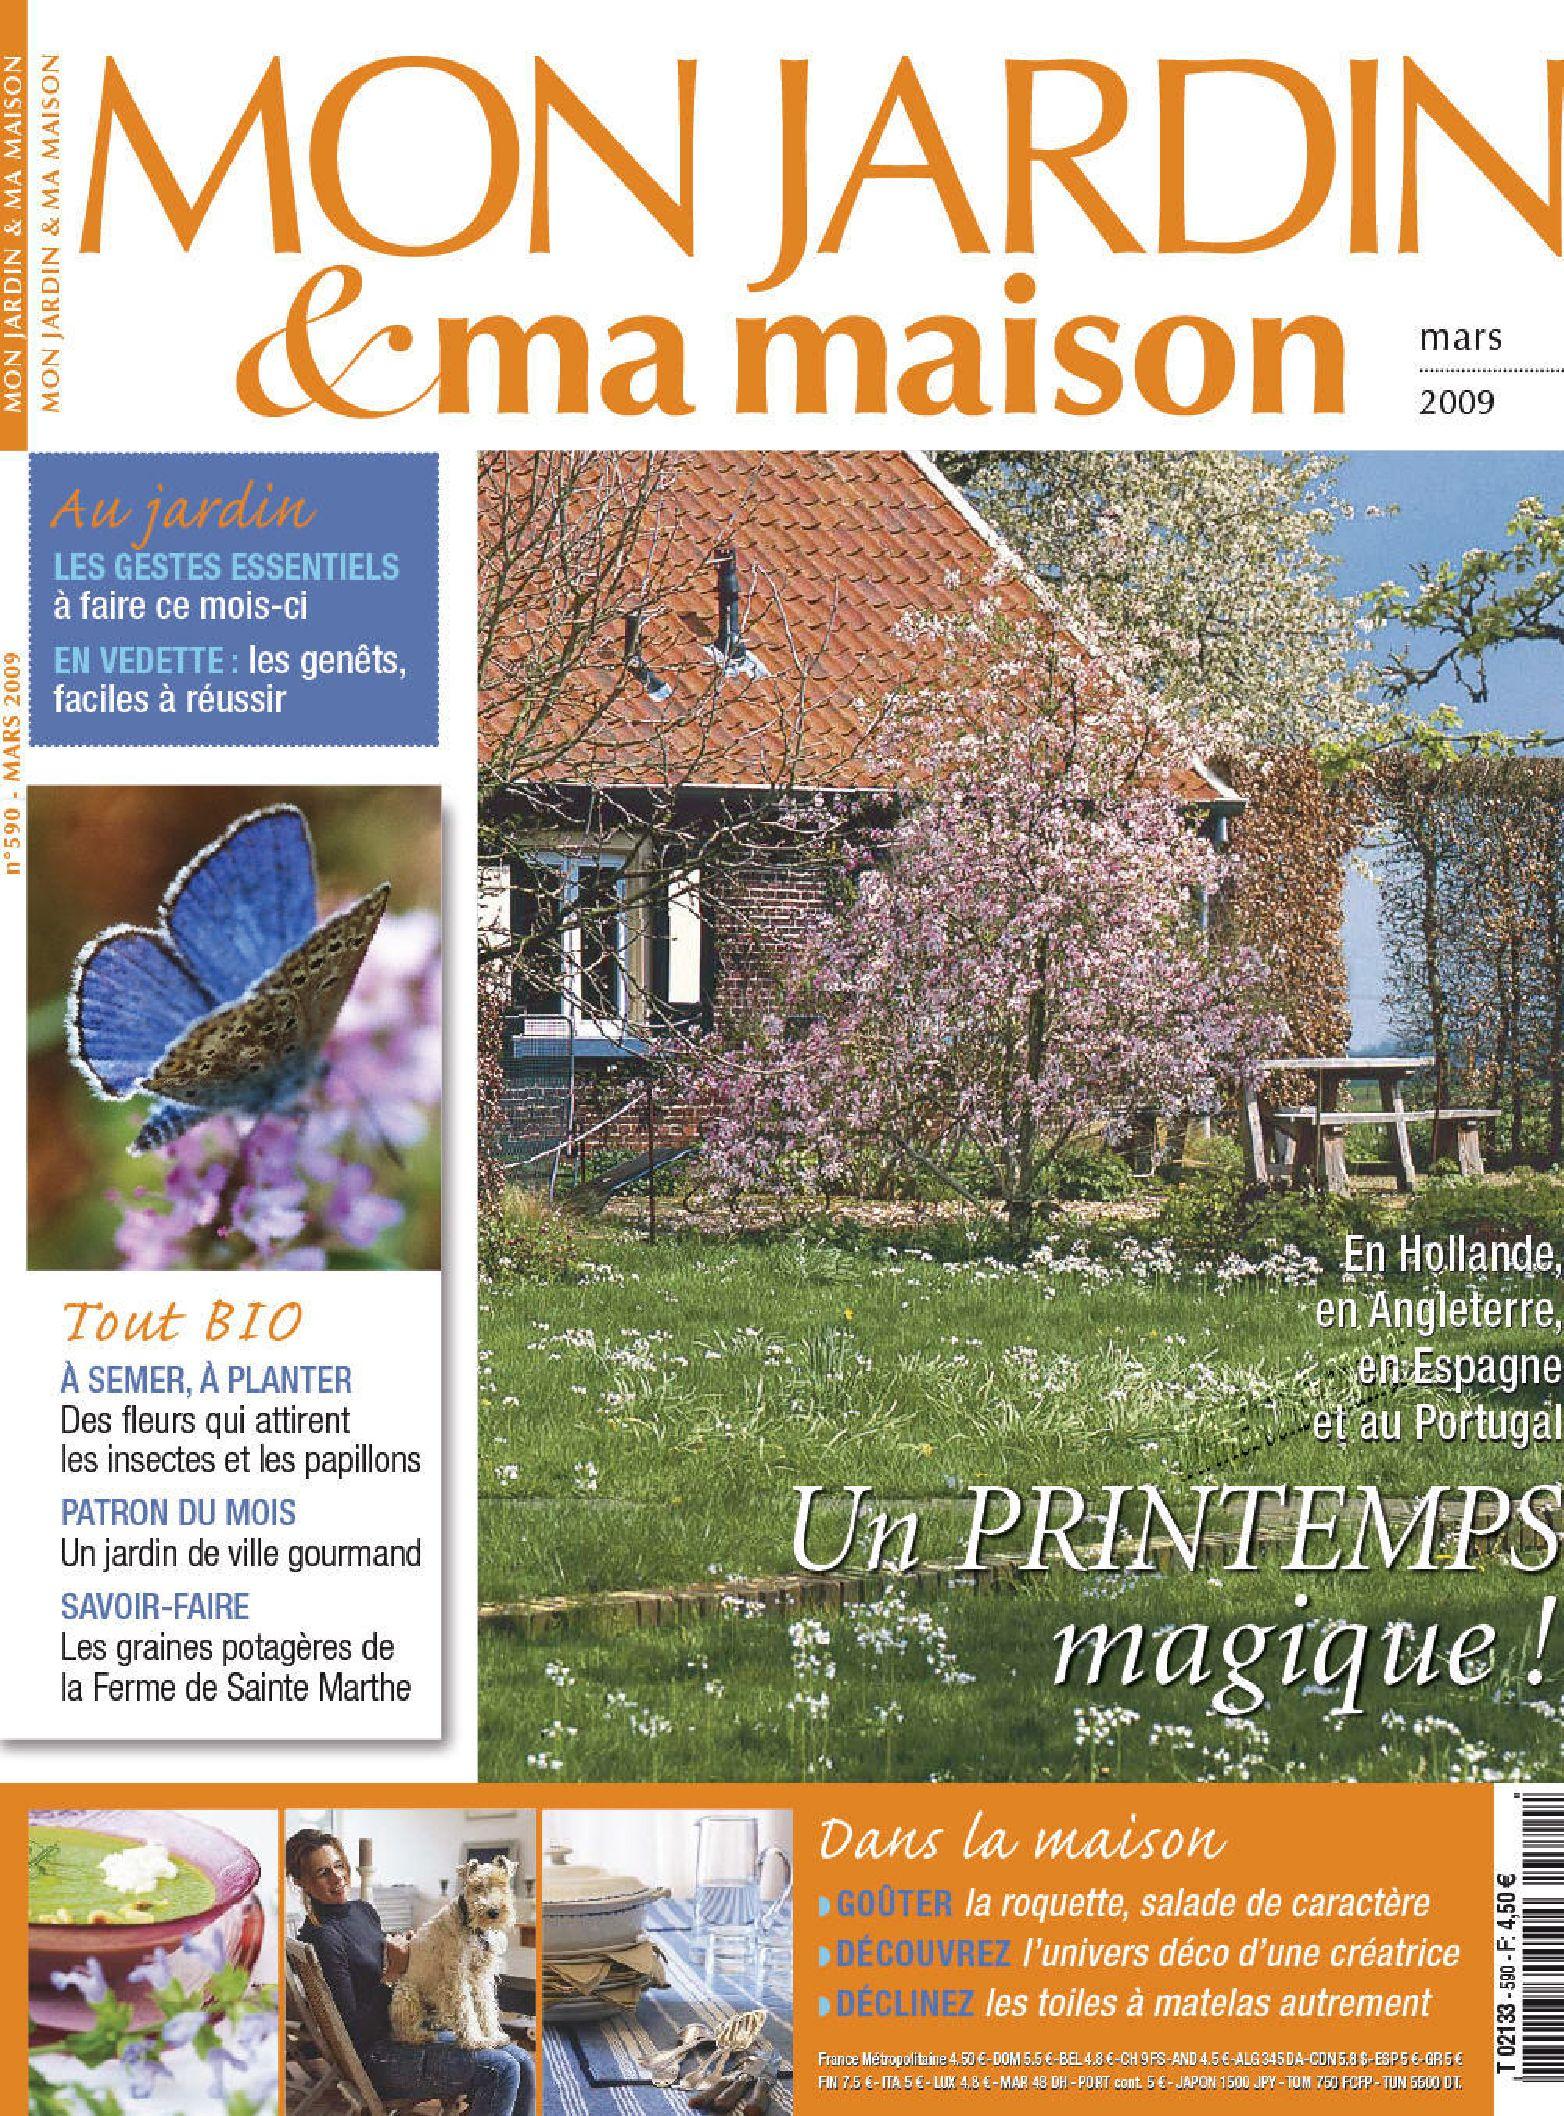 Mon.jardin.ma.maison.french.mag-Eland By Ebooks Land - Issuu destiné Magazine Mon Jardin Et Ma Maison